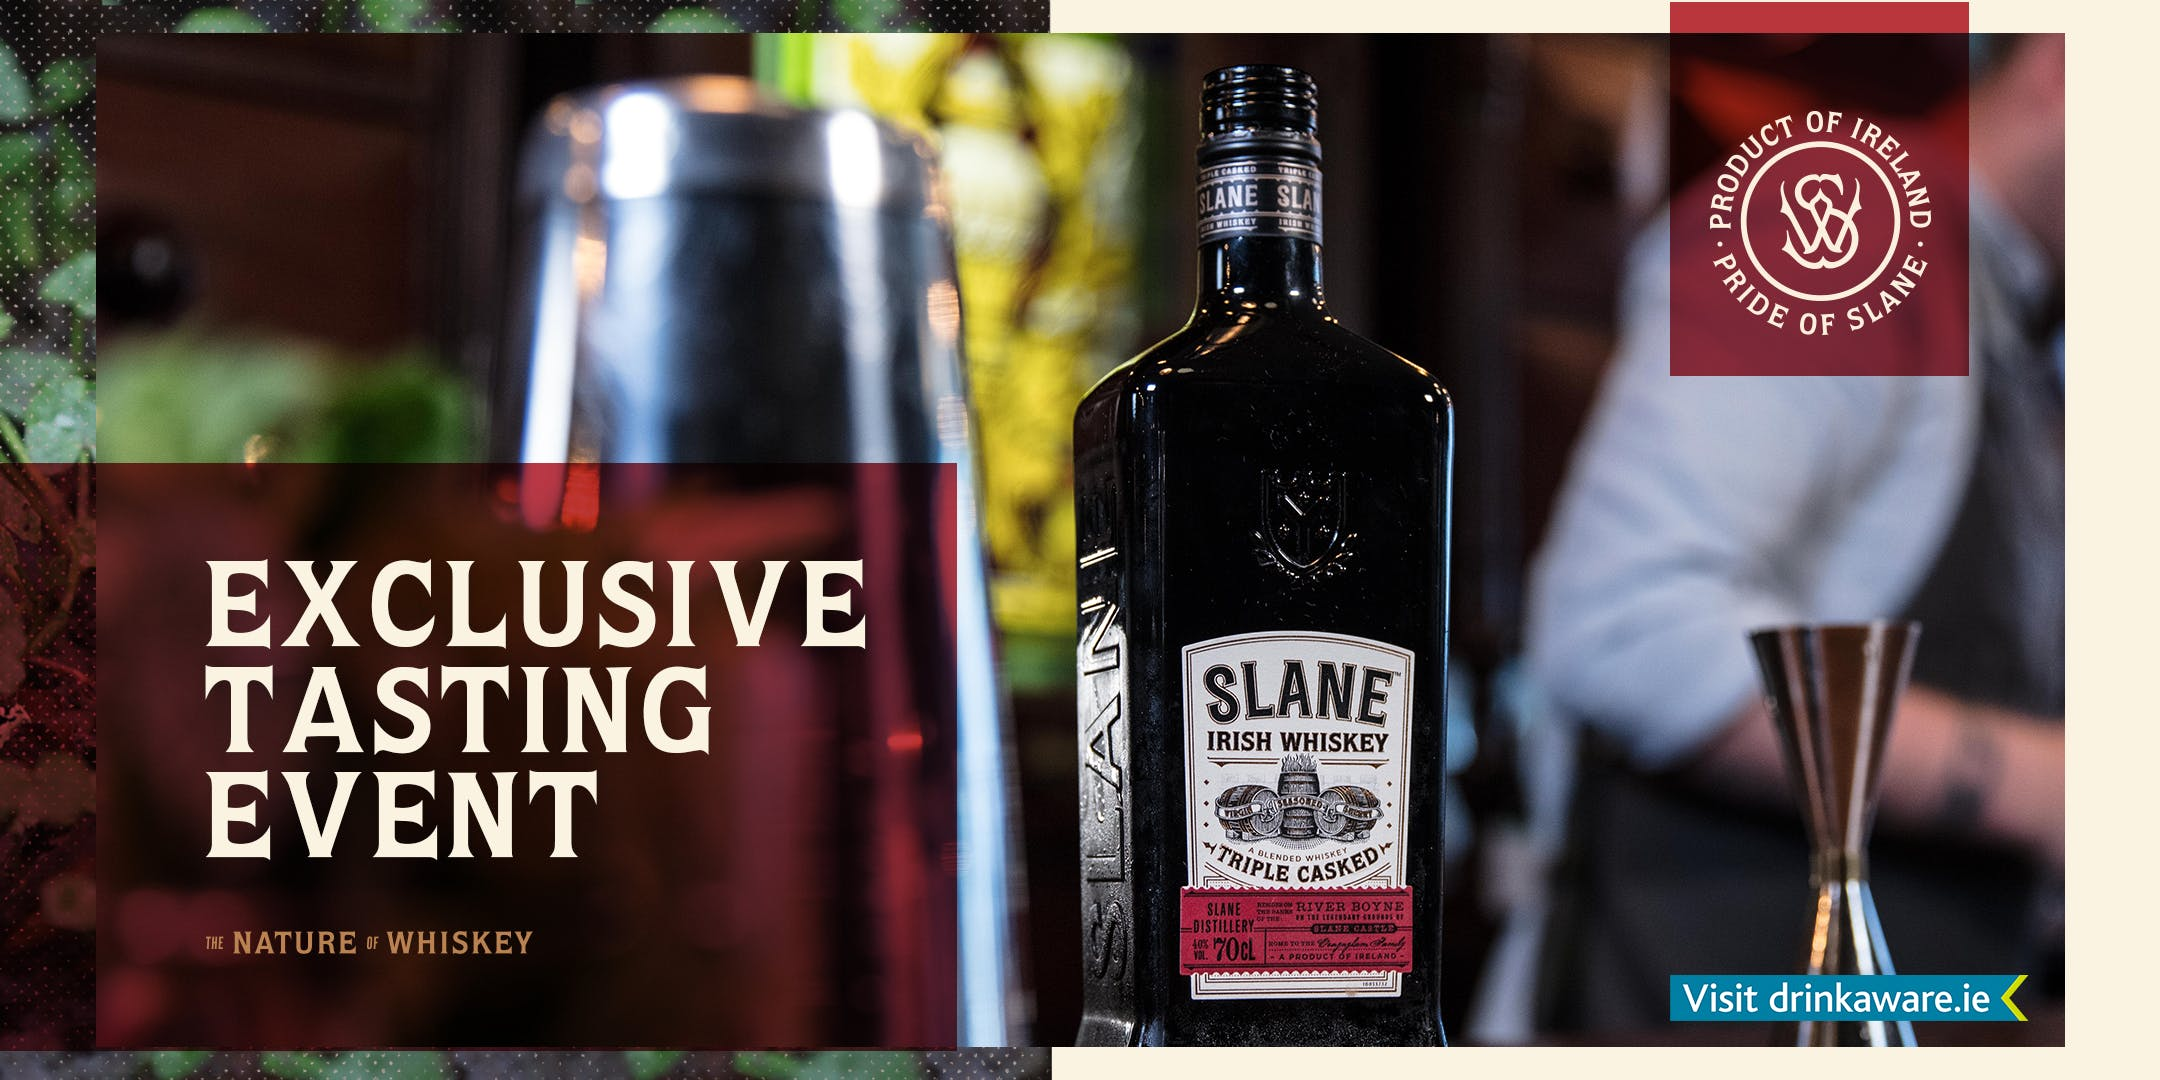 Slane Whiskey Tasting Experience at The Long Hall